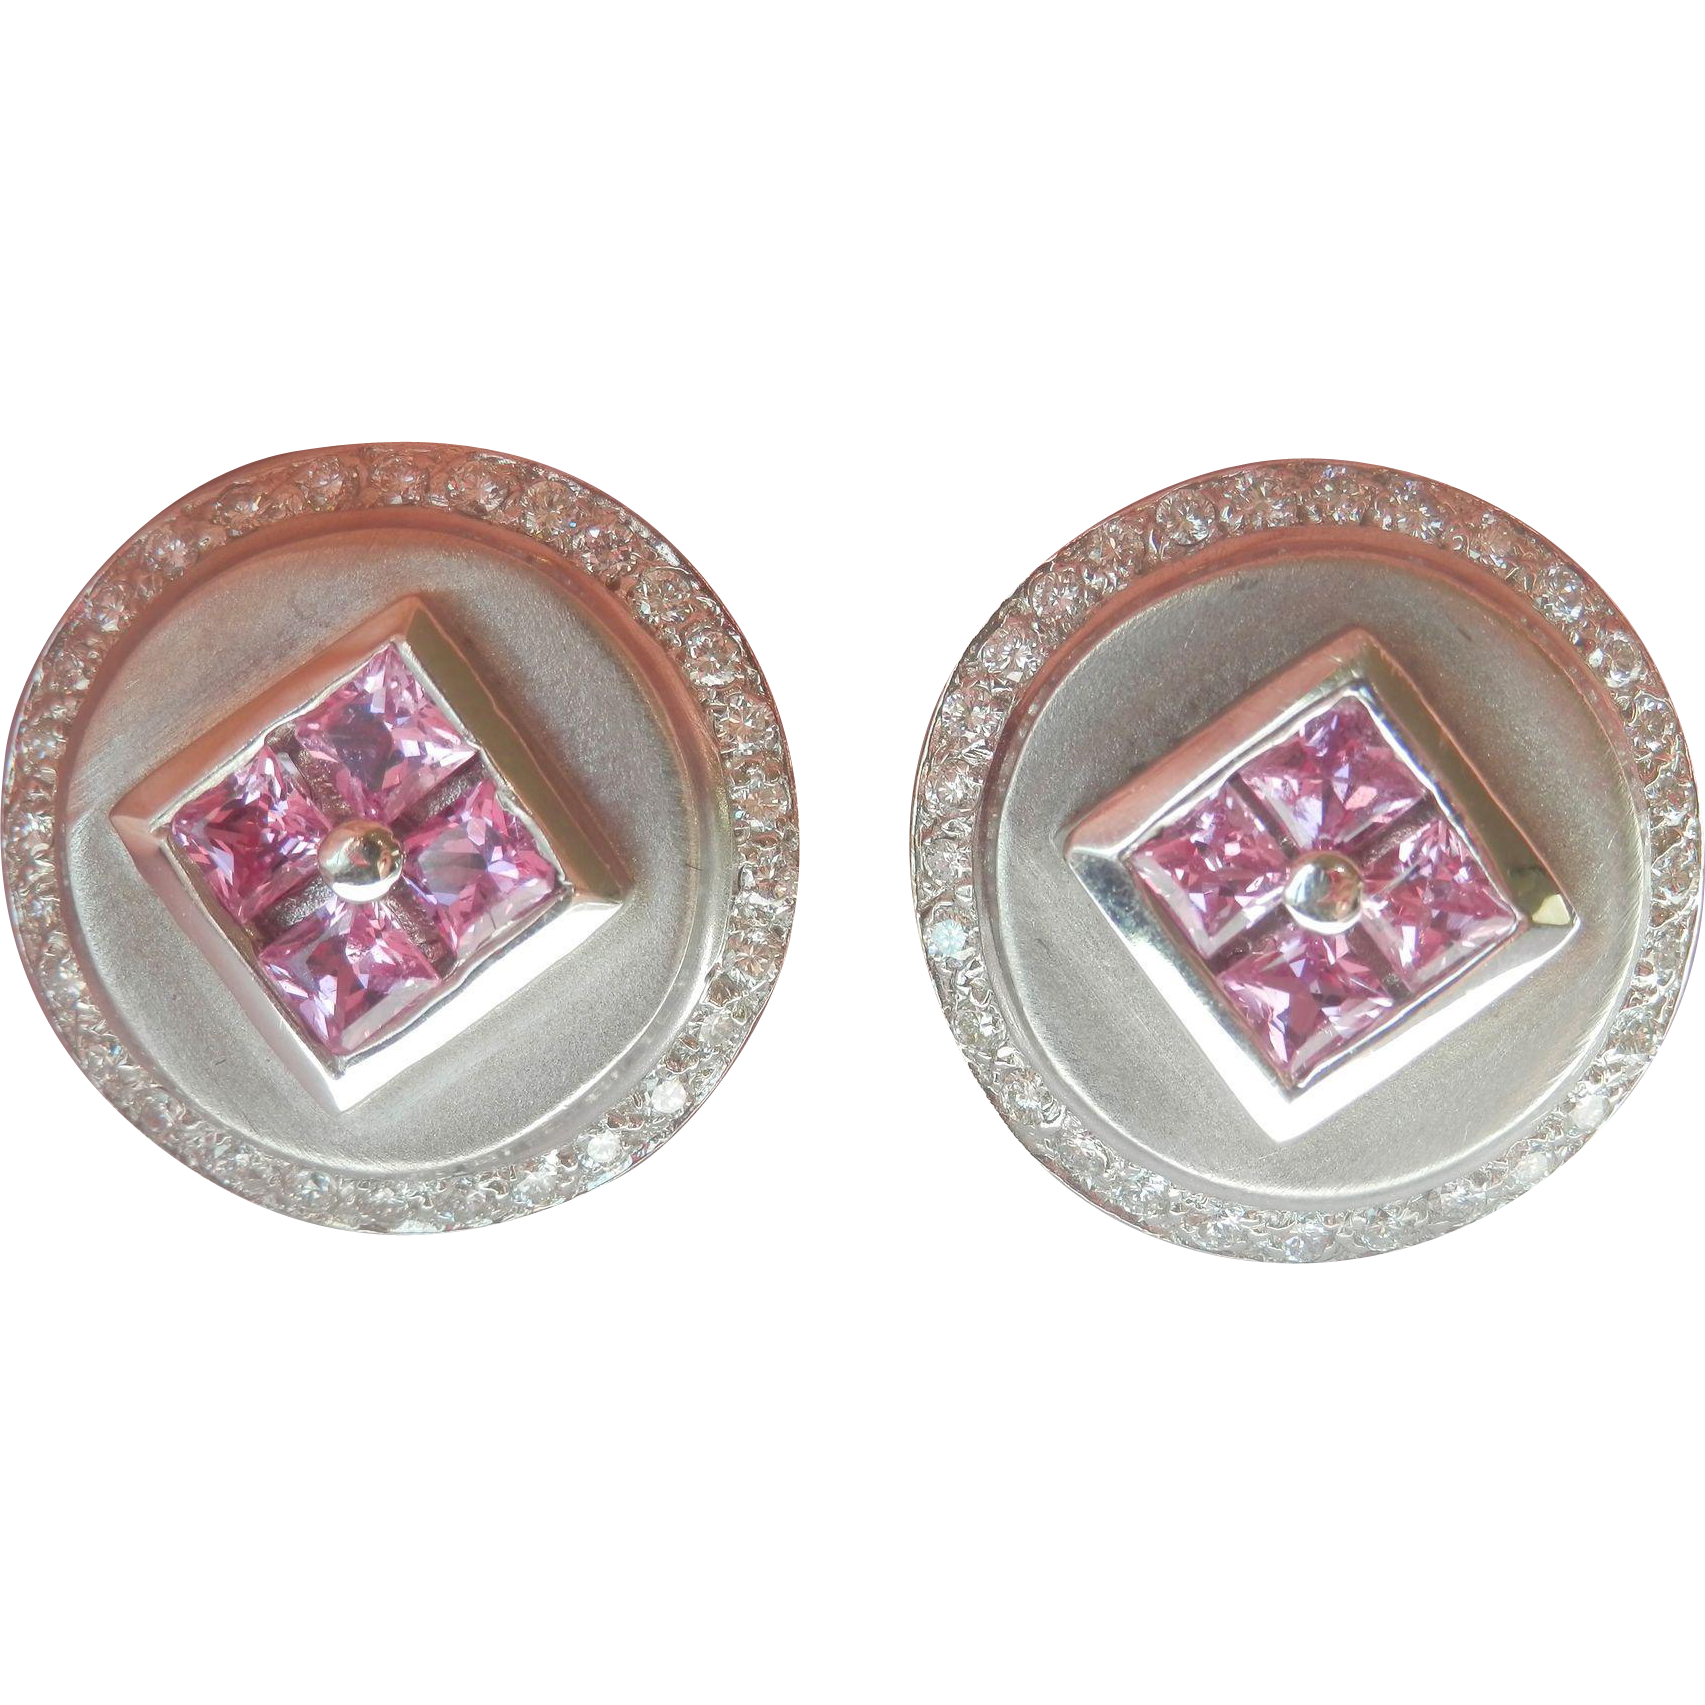 Gorgeous Large 14K White Gold Estate Large Pink Sapphire .80ct Diamond Earrings~12 grams!